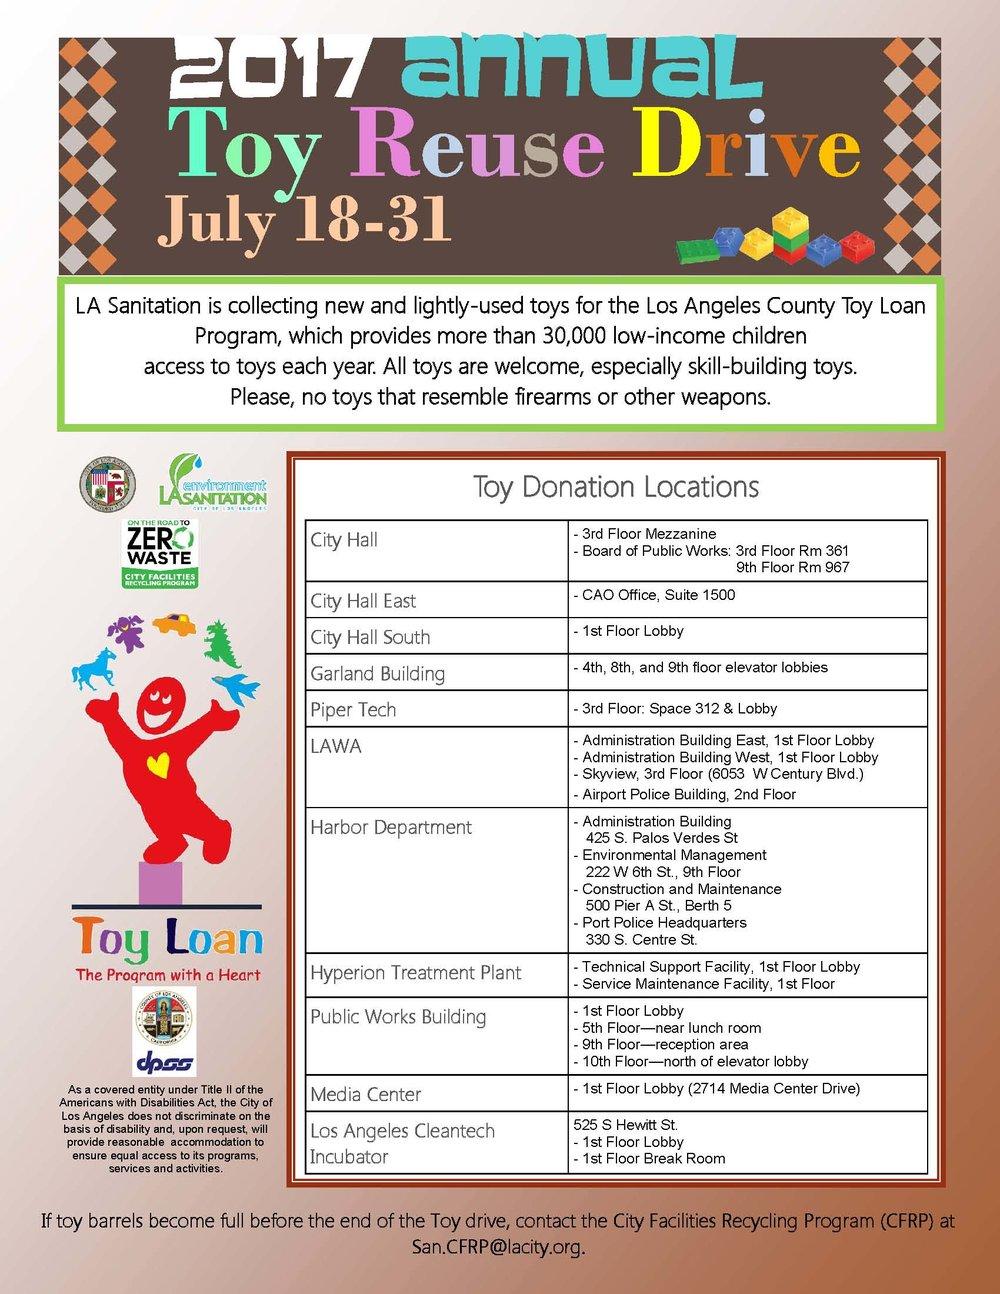 Toy Reuse Drive 2017 Flyer.jpg